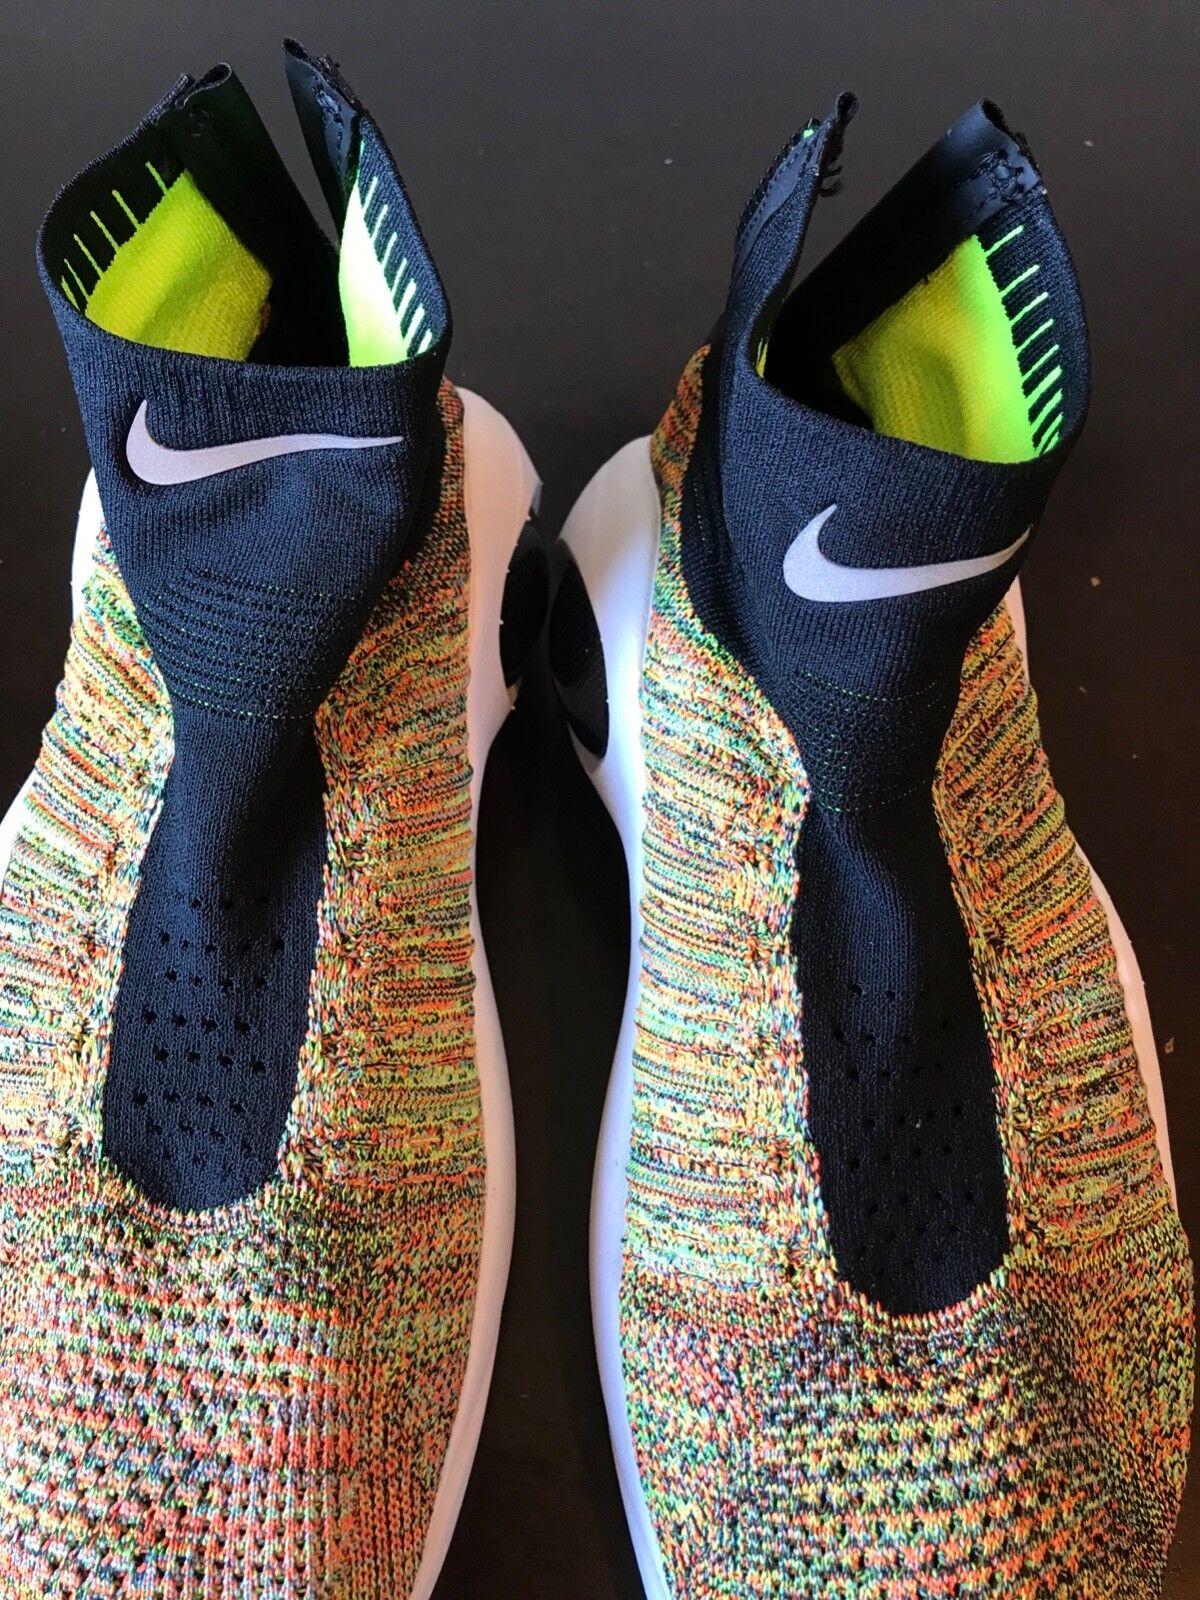 Nike Flight Bonafide SZ 10.5 Fly Knit Multi color color color Jason Kidd 917742-003 e05718